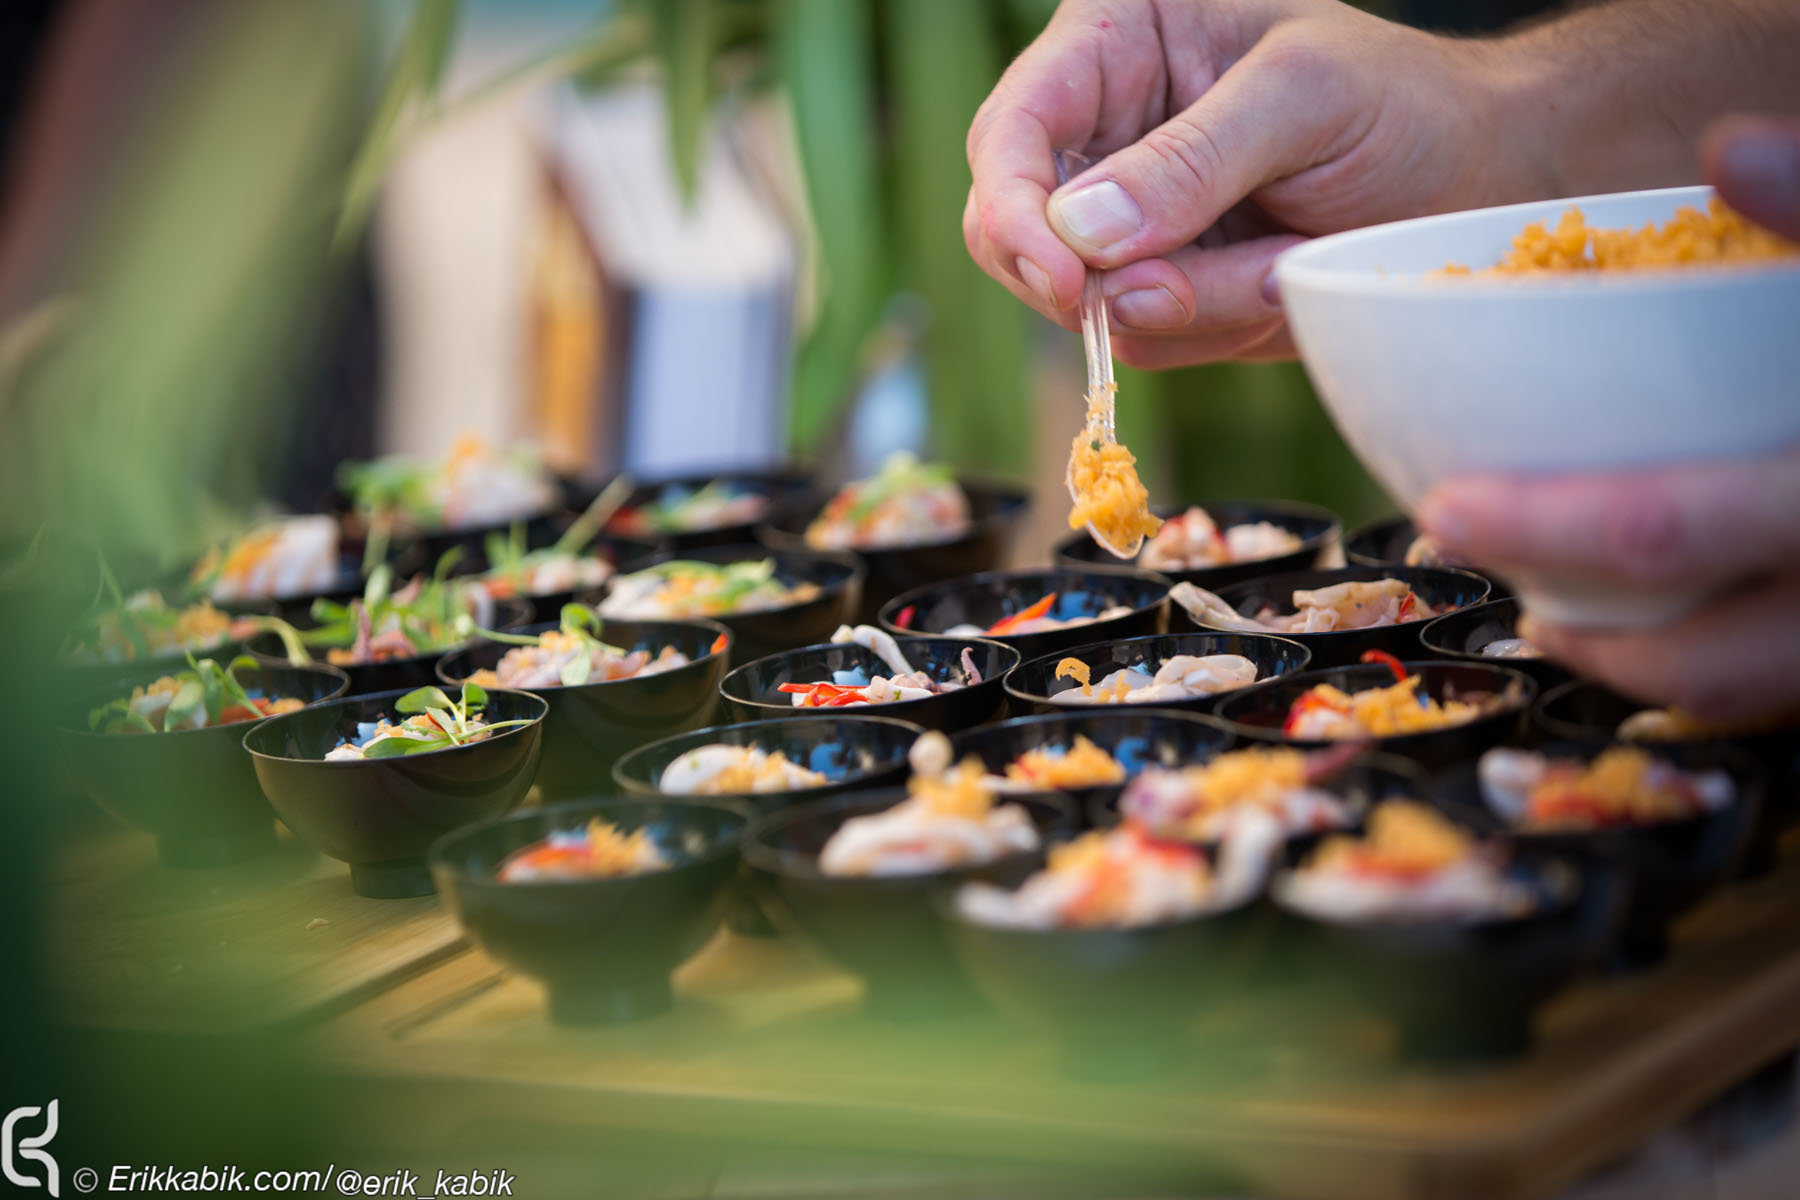 6_5_15_batali_carnival_cuisine_kabik-177.jpg